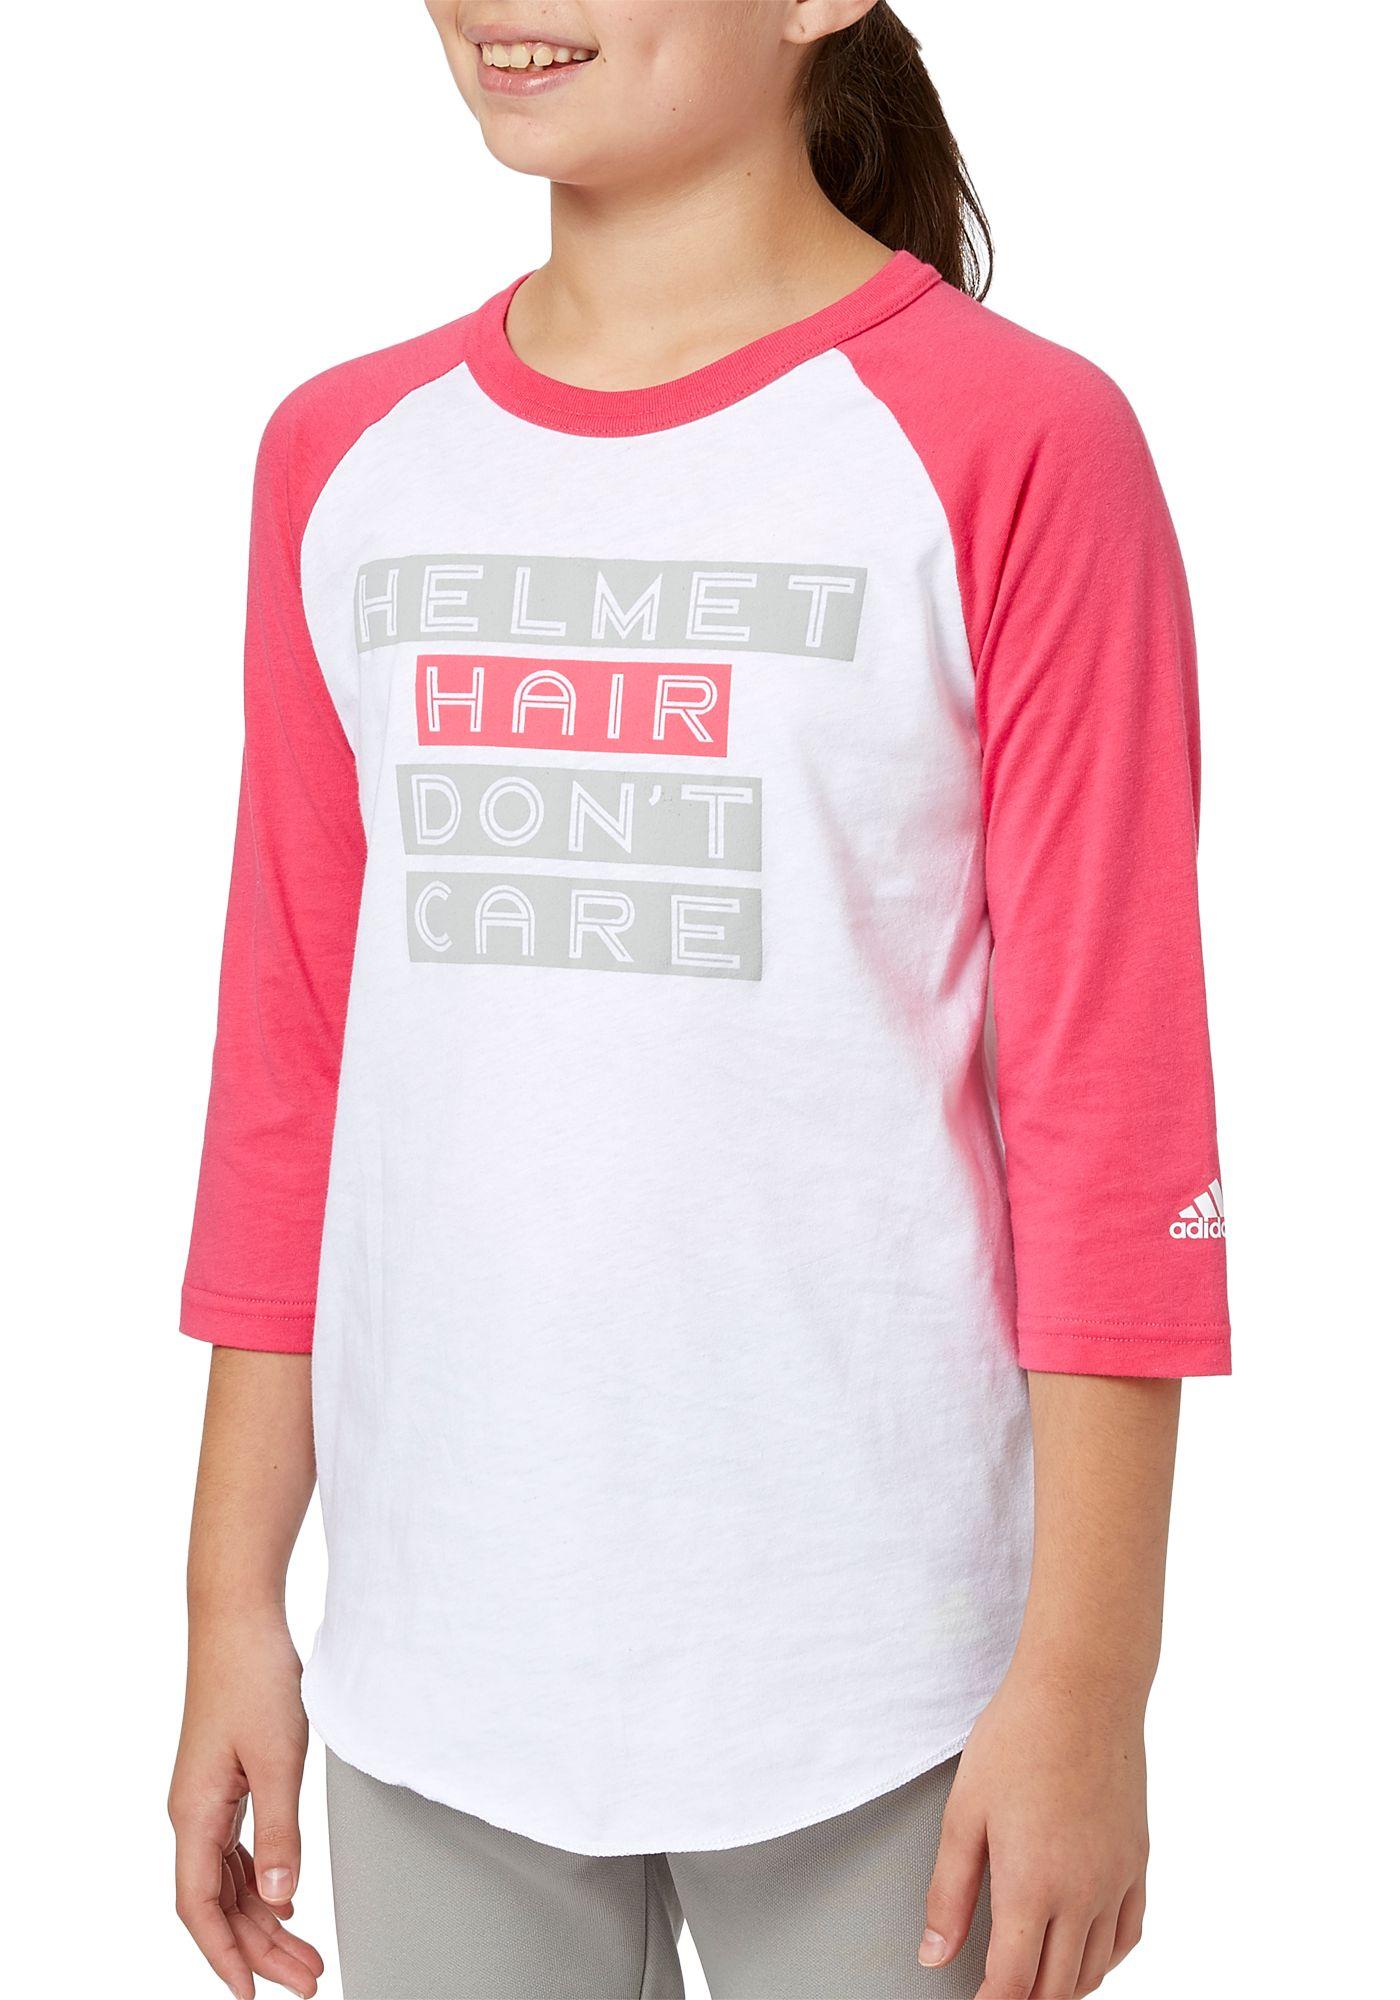 adidas Girls' Helmet Hair ¾ Sleeve Softball Shirt